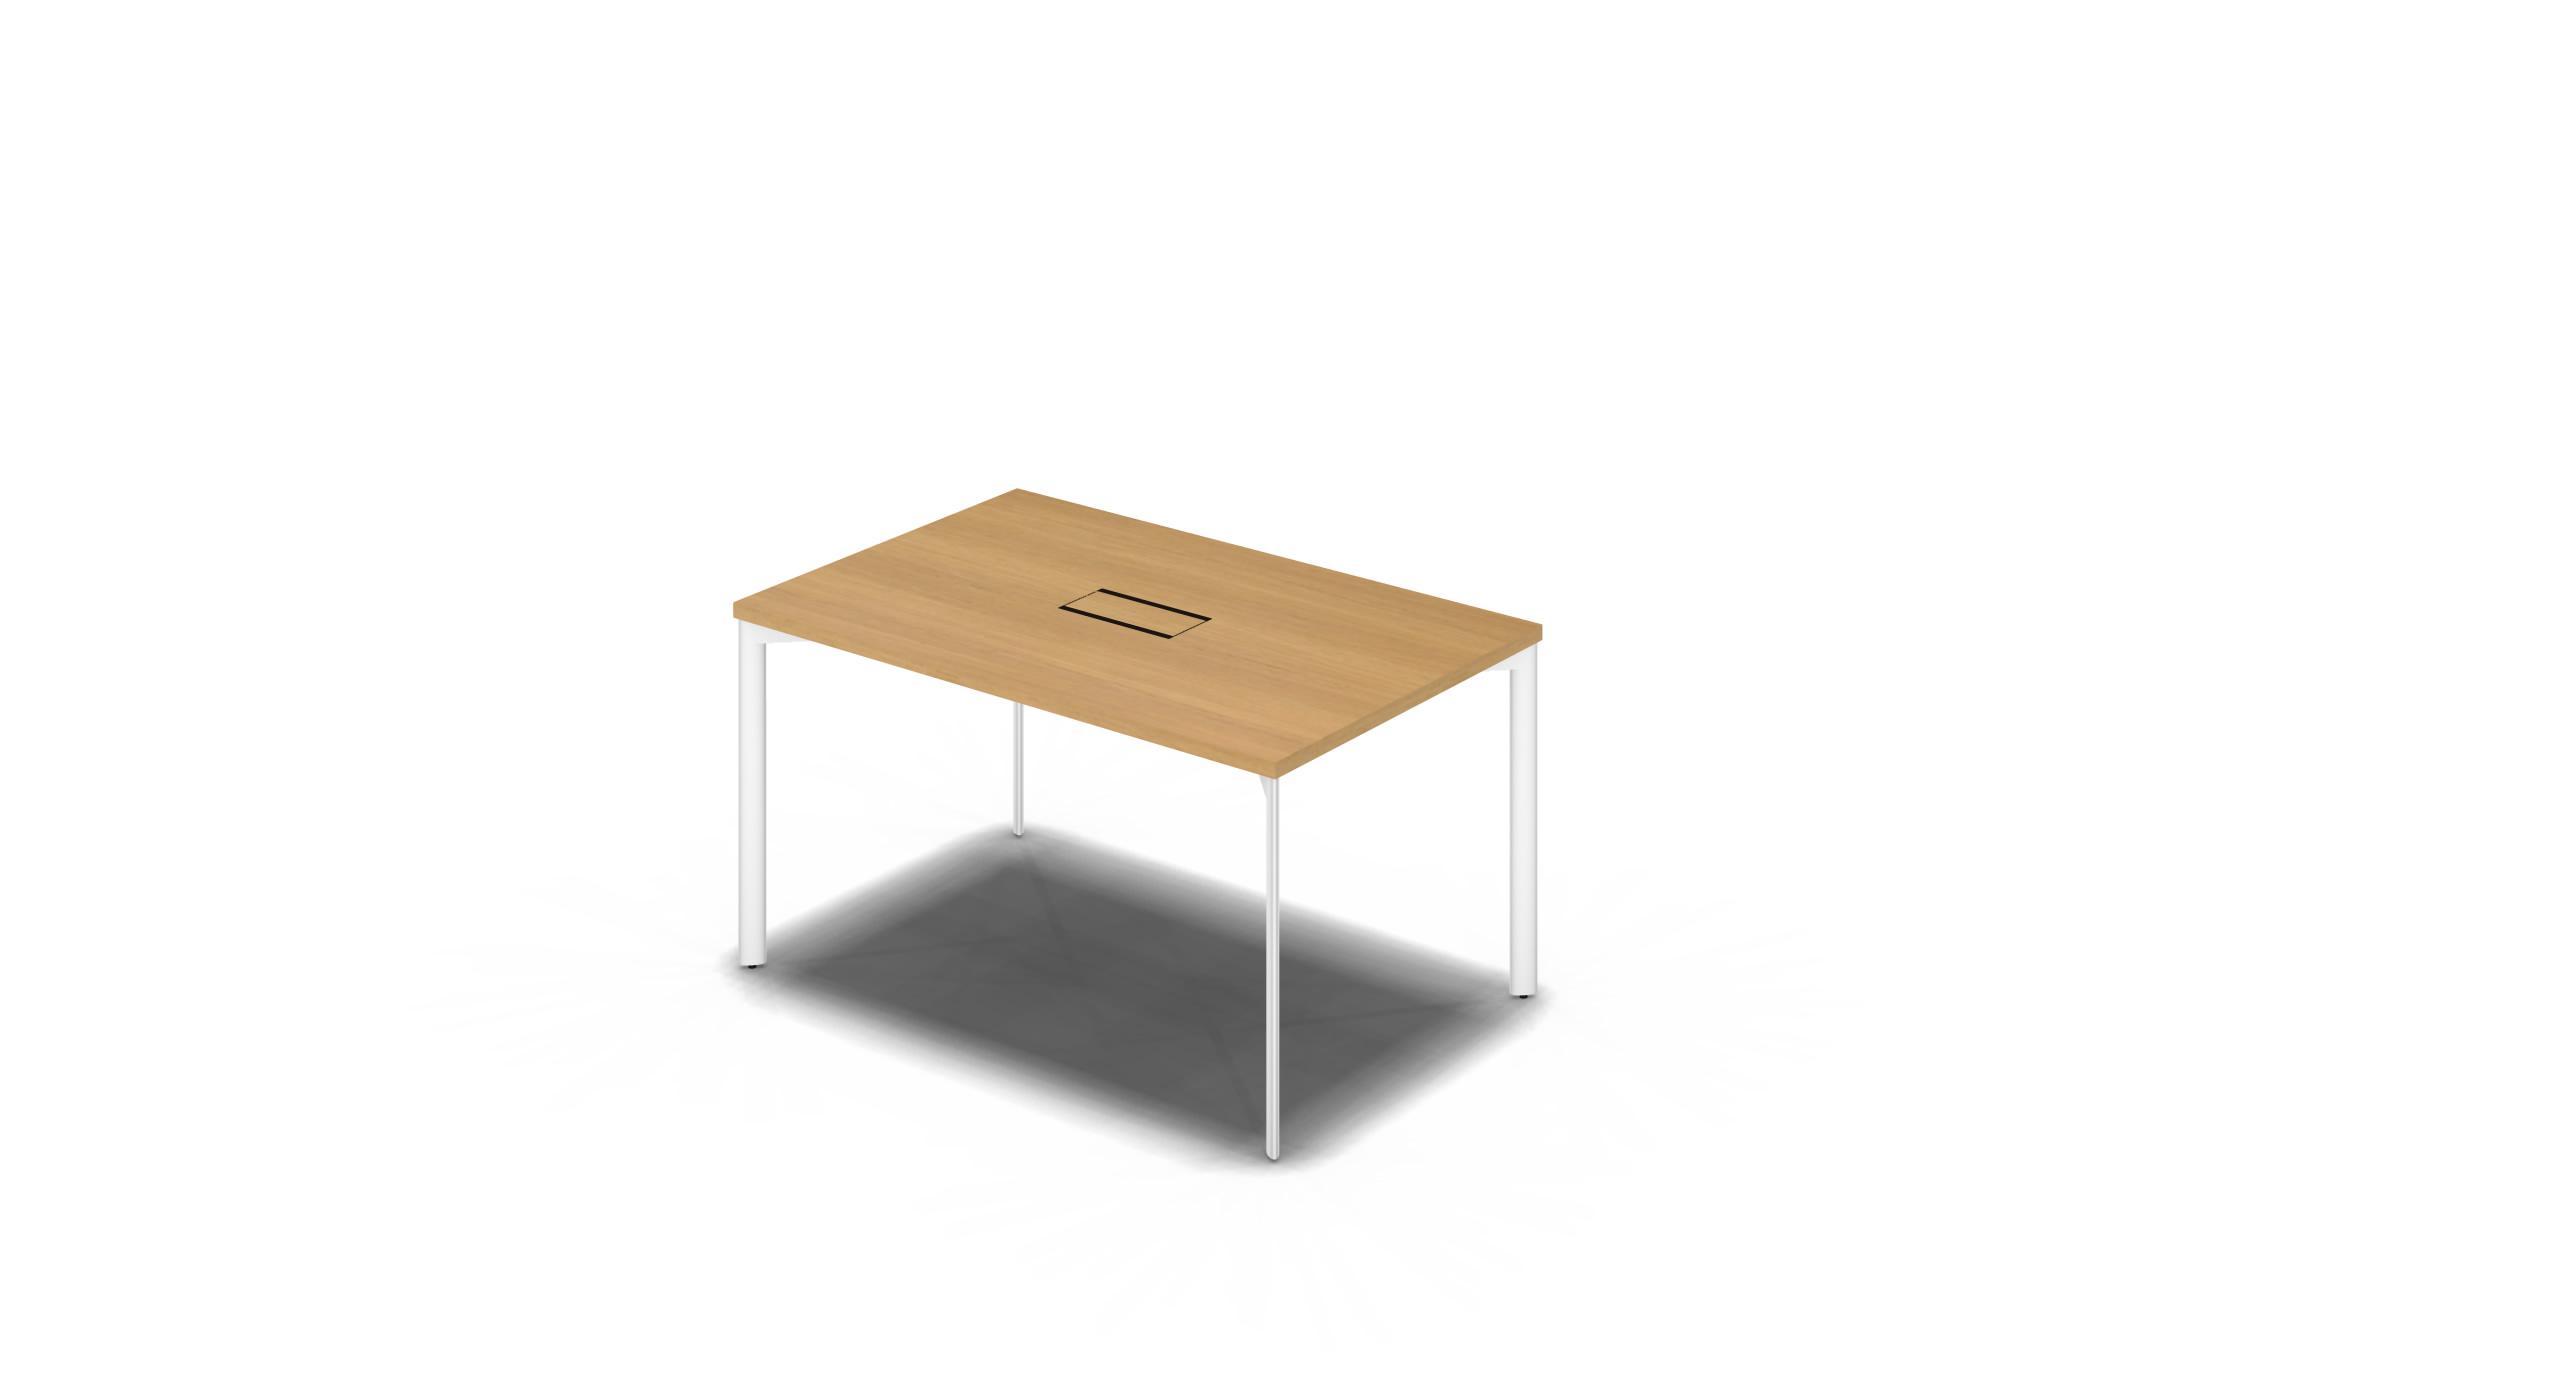 Table_Slim_1200x750_White_Oak_withOption